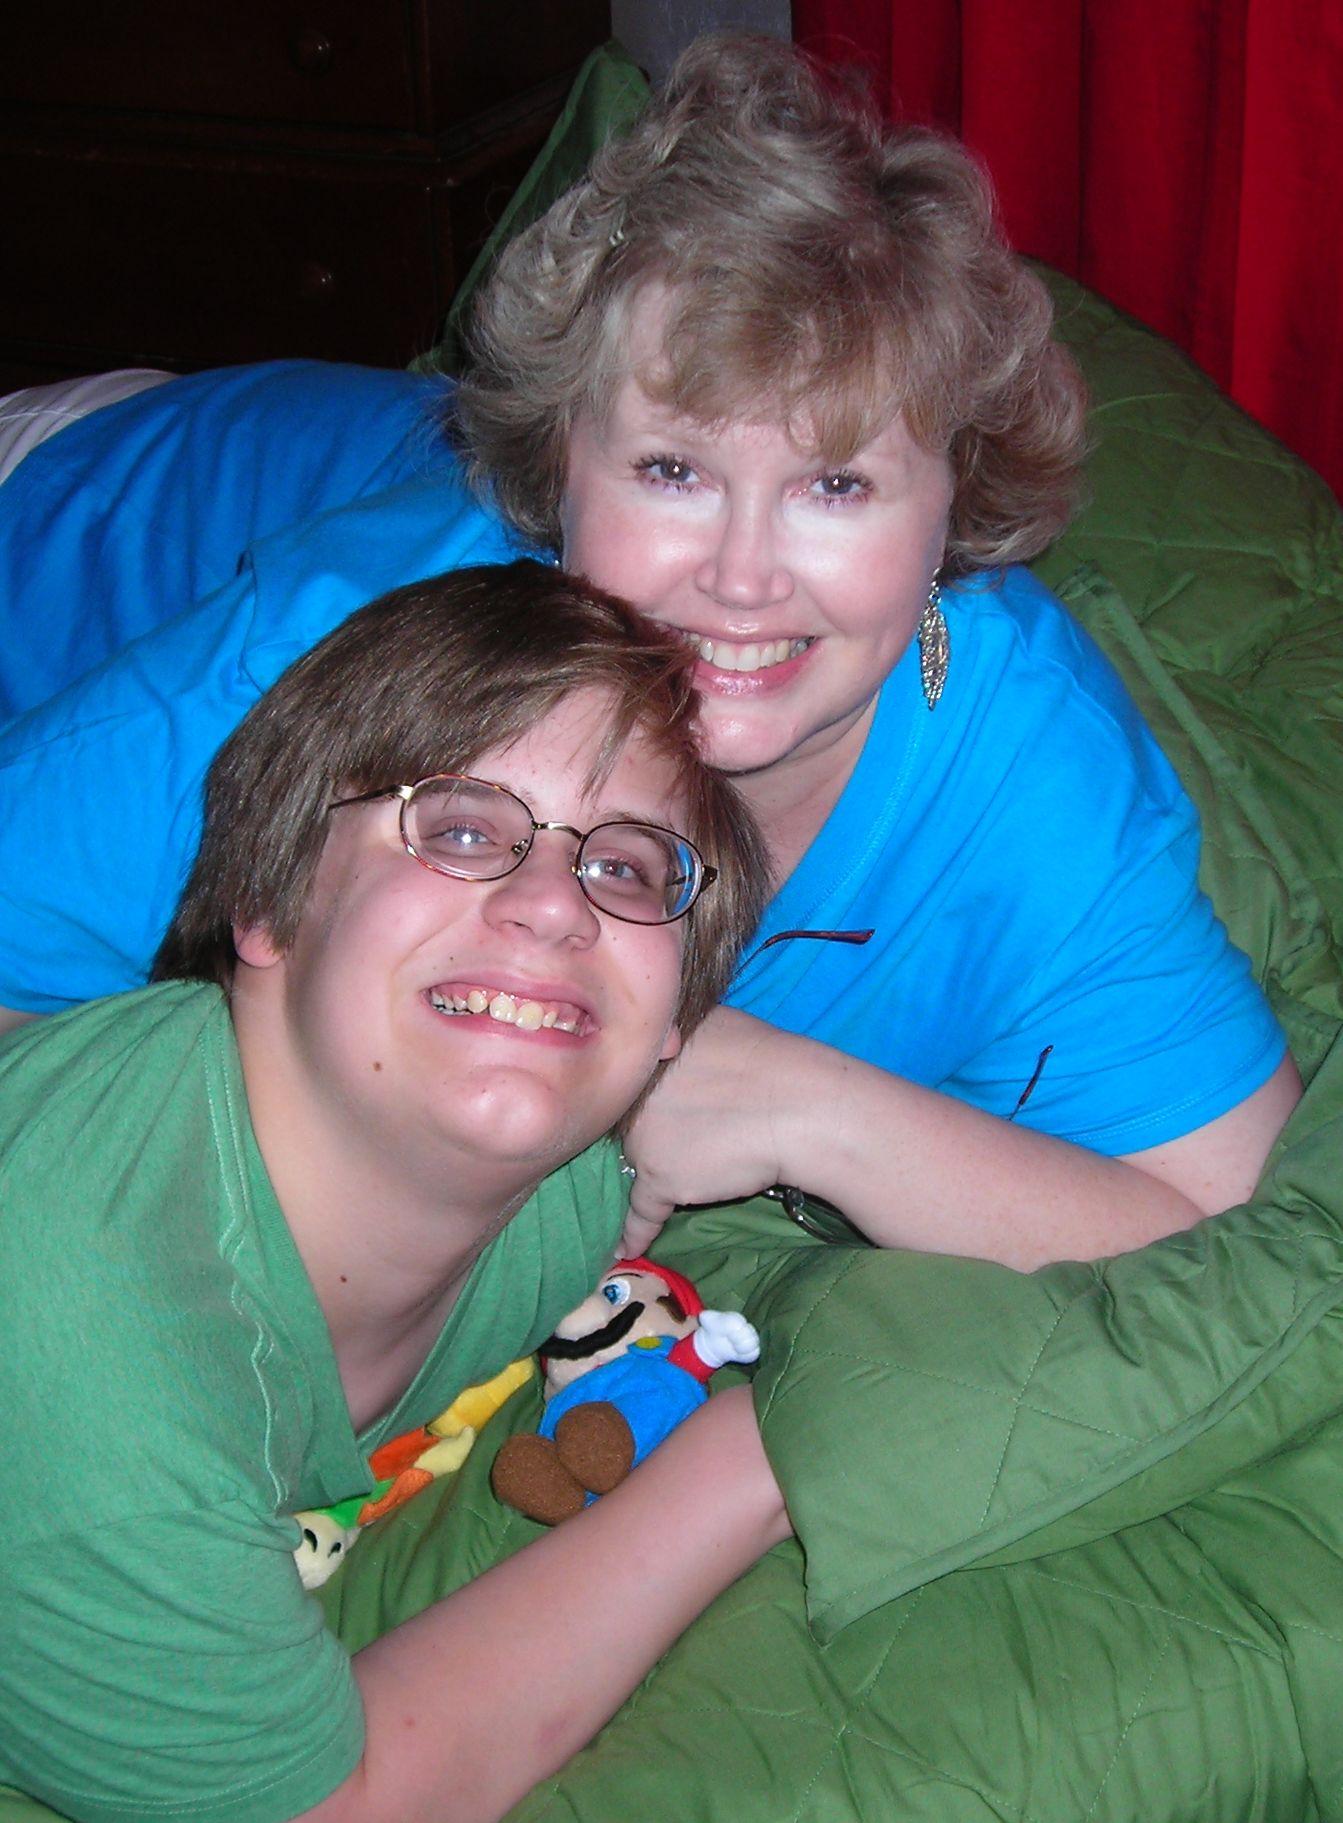 Matt and me, enjoying his new 'Luigi green' bedspread